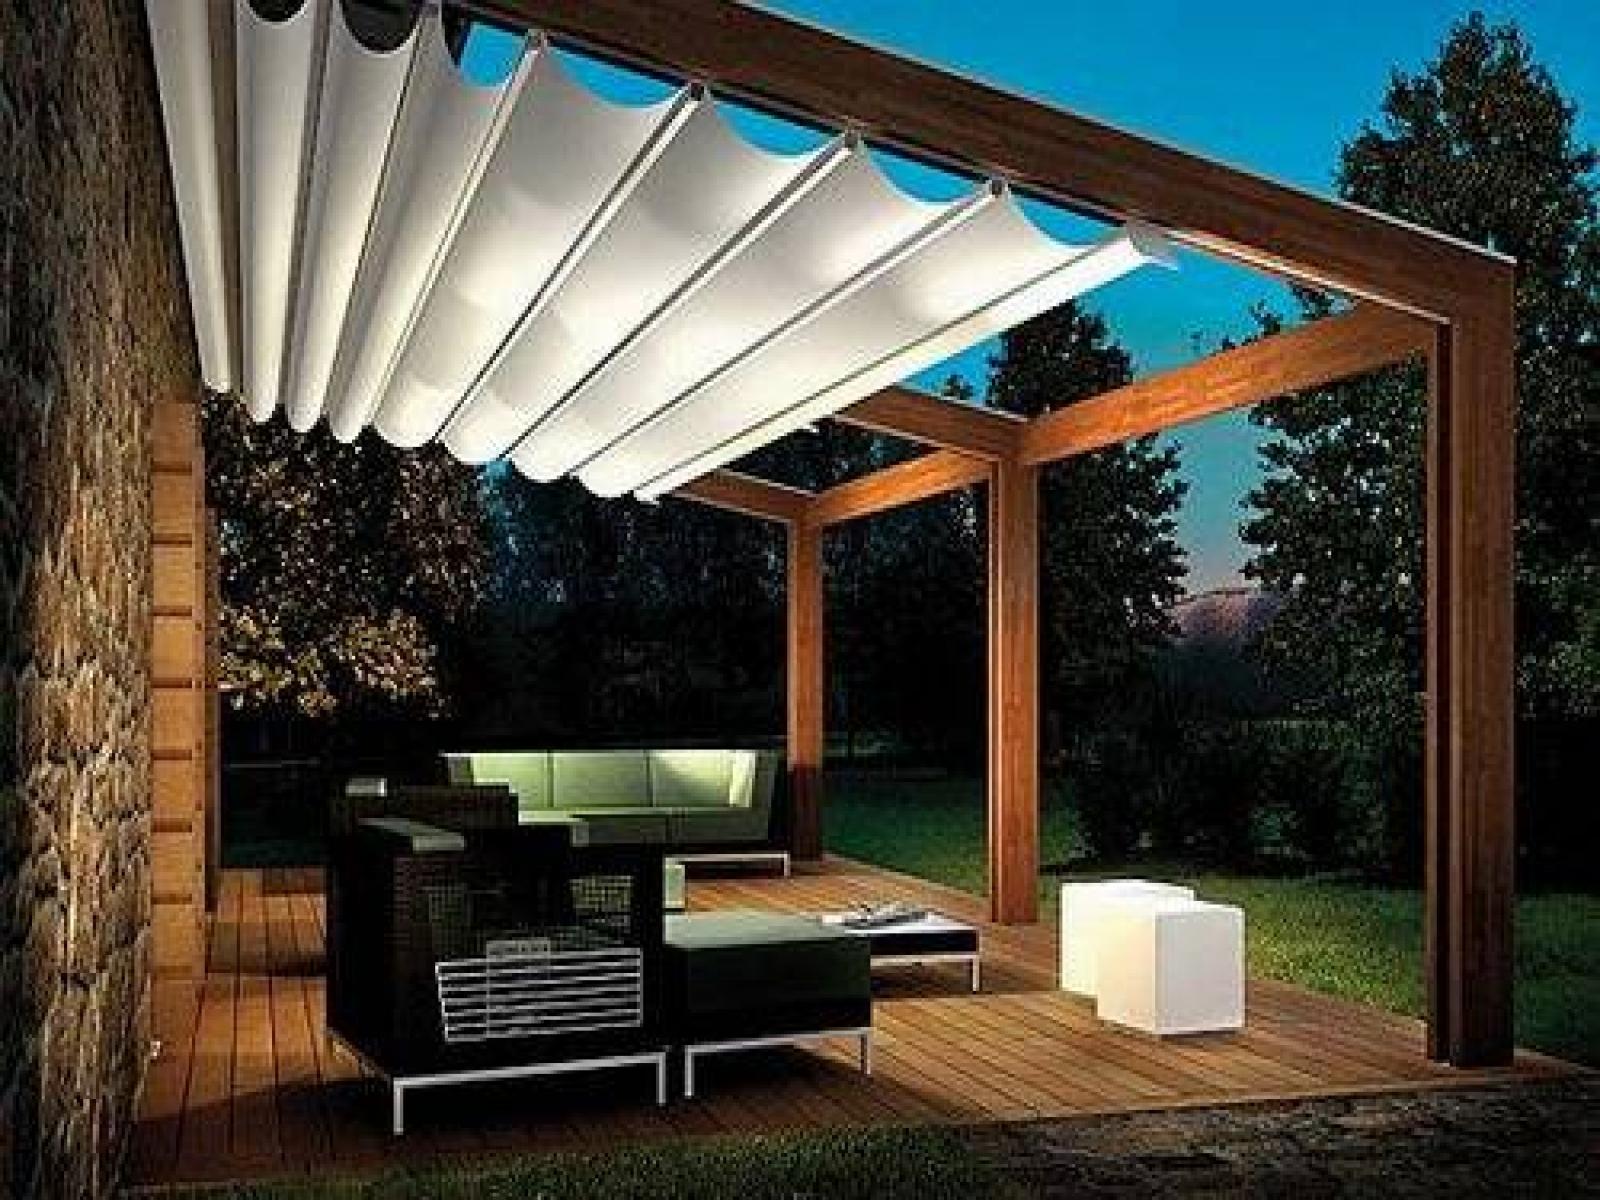 outdoor_canopy_lighting_ideas_45_1600_1200